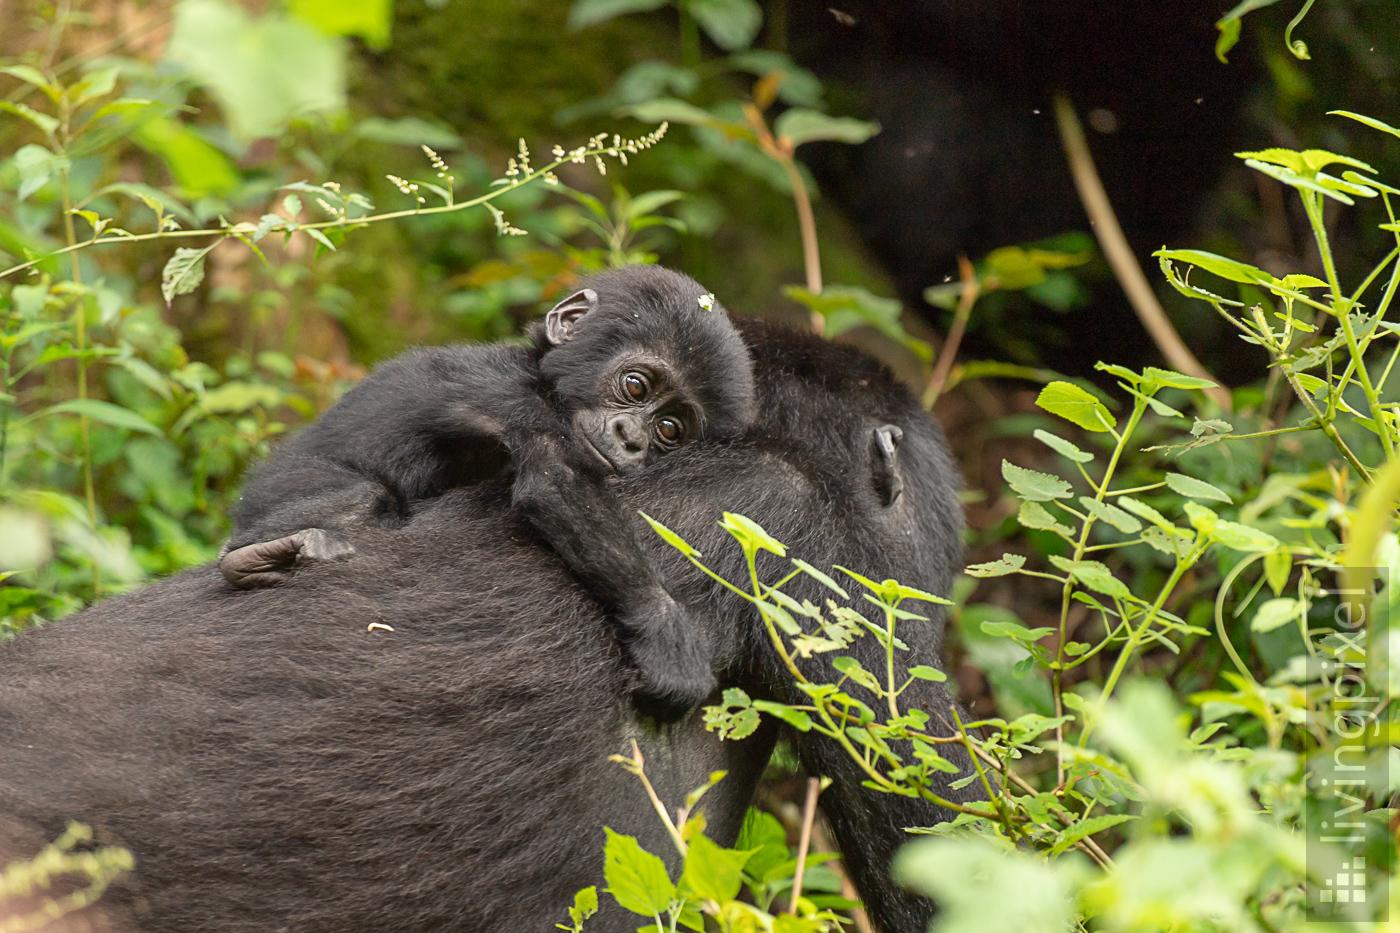 Berggorilla (Mountain gorilla)